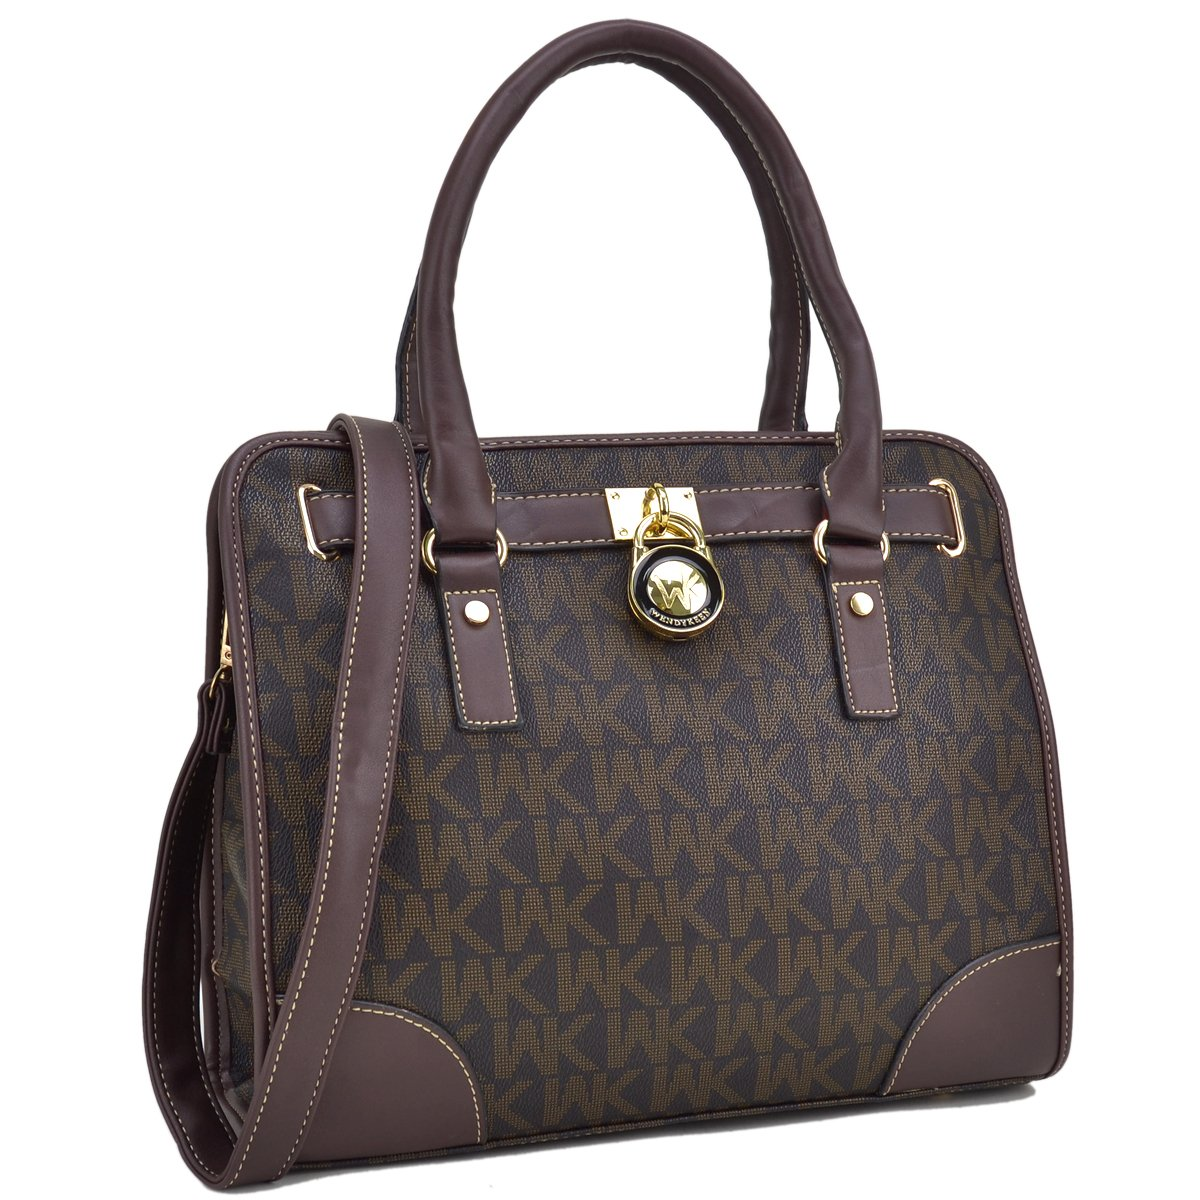 Medium Satchel Purse Designer Handbag Top Handle Shoulder Bag Padlock Coffee